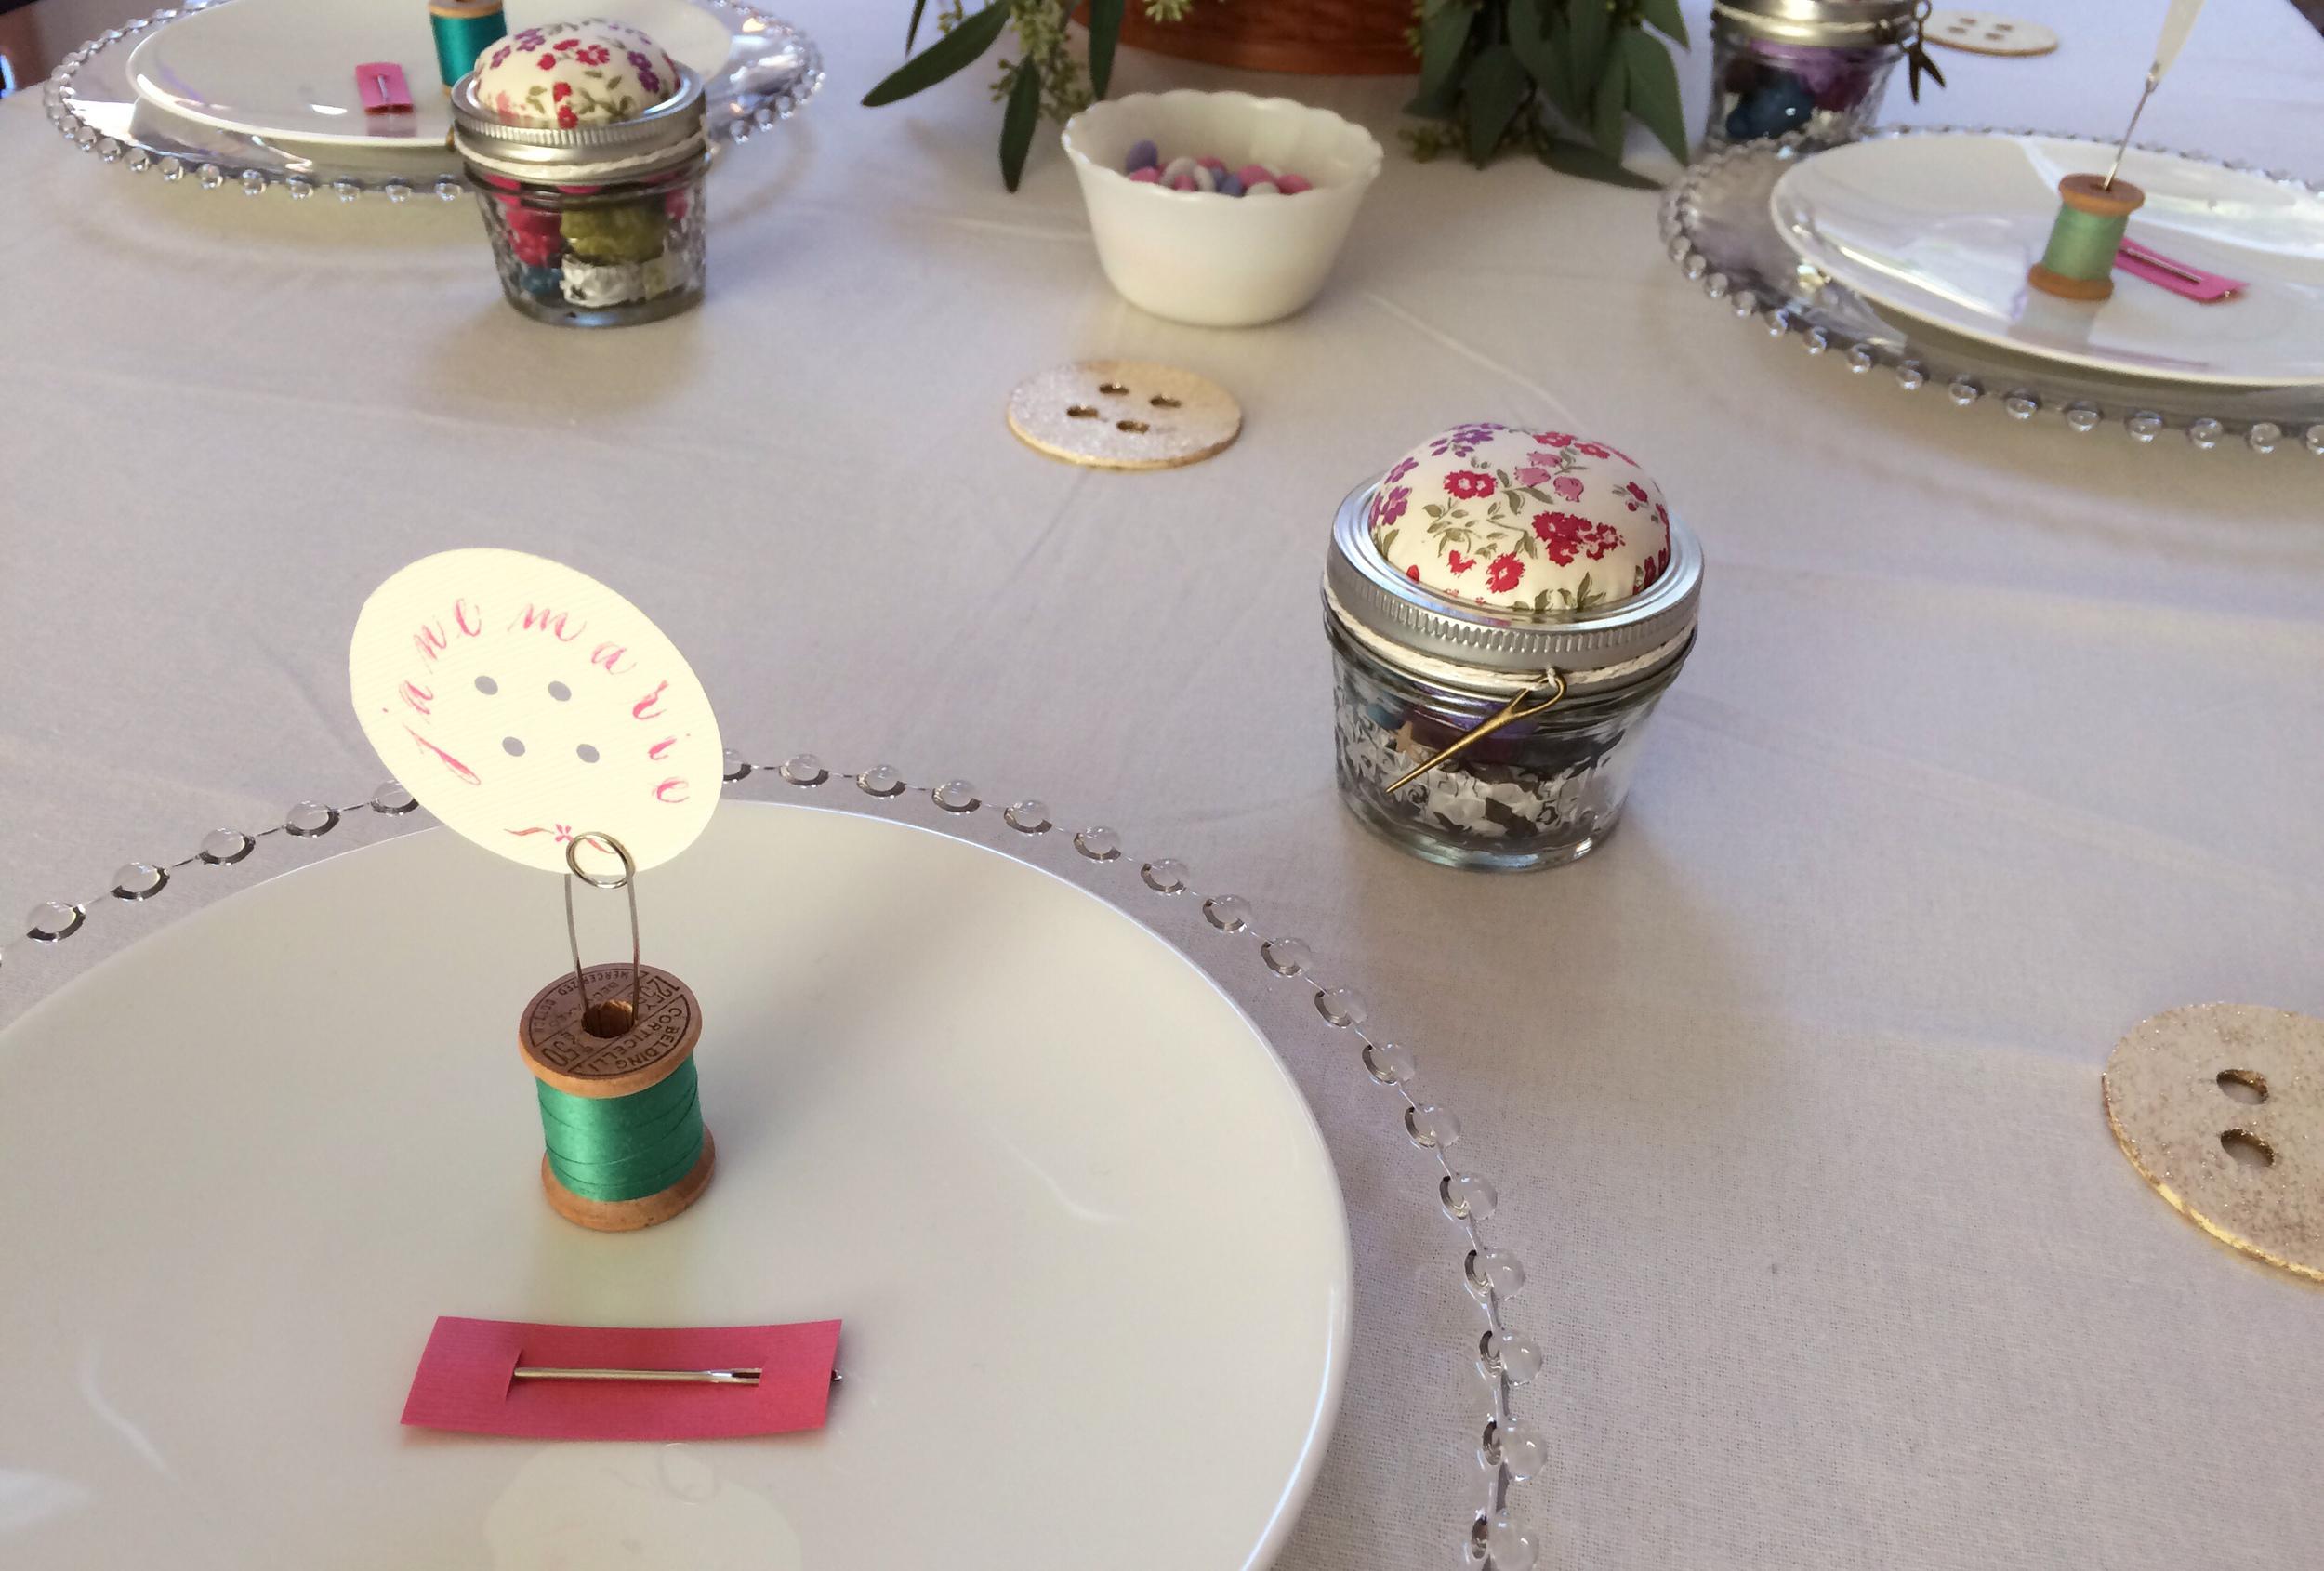 Hibiki's Sewing Party